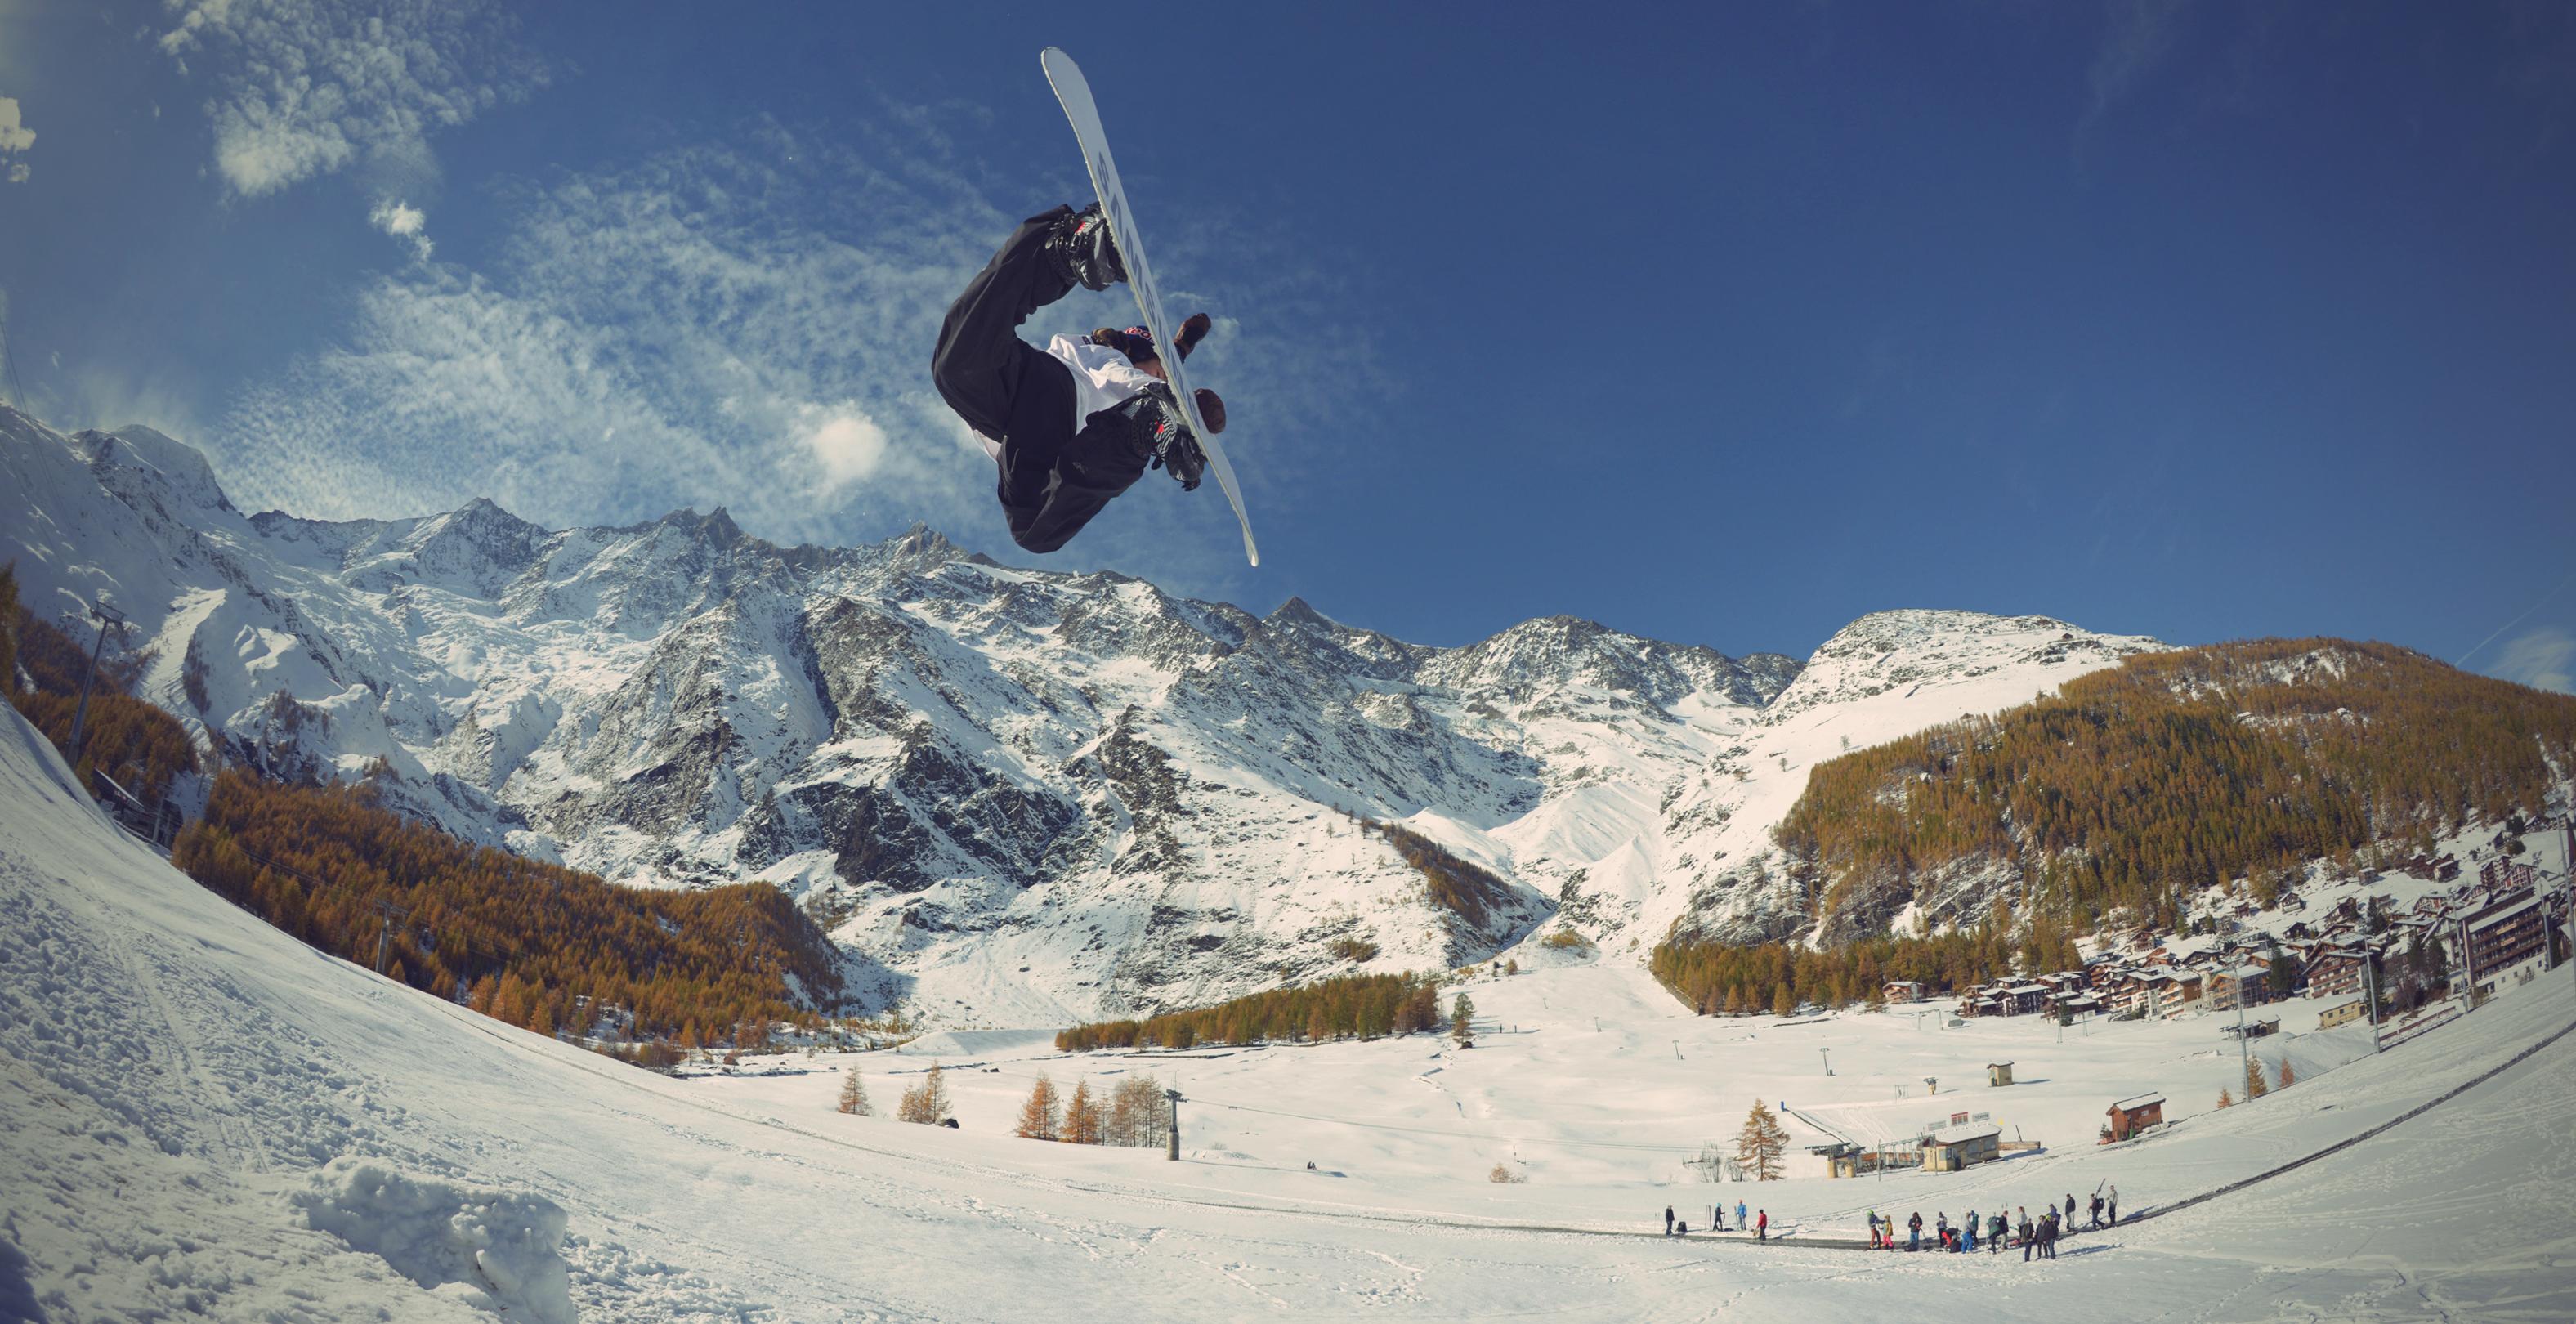 David Habluetzel TSG snowboard team rider